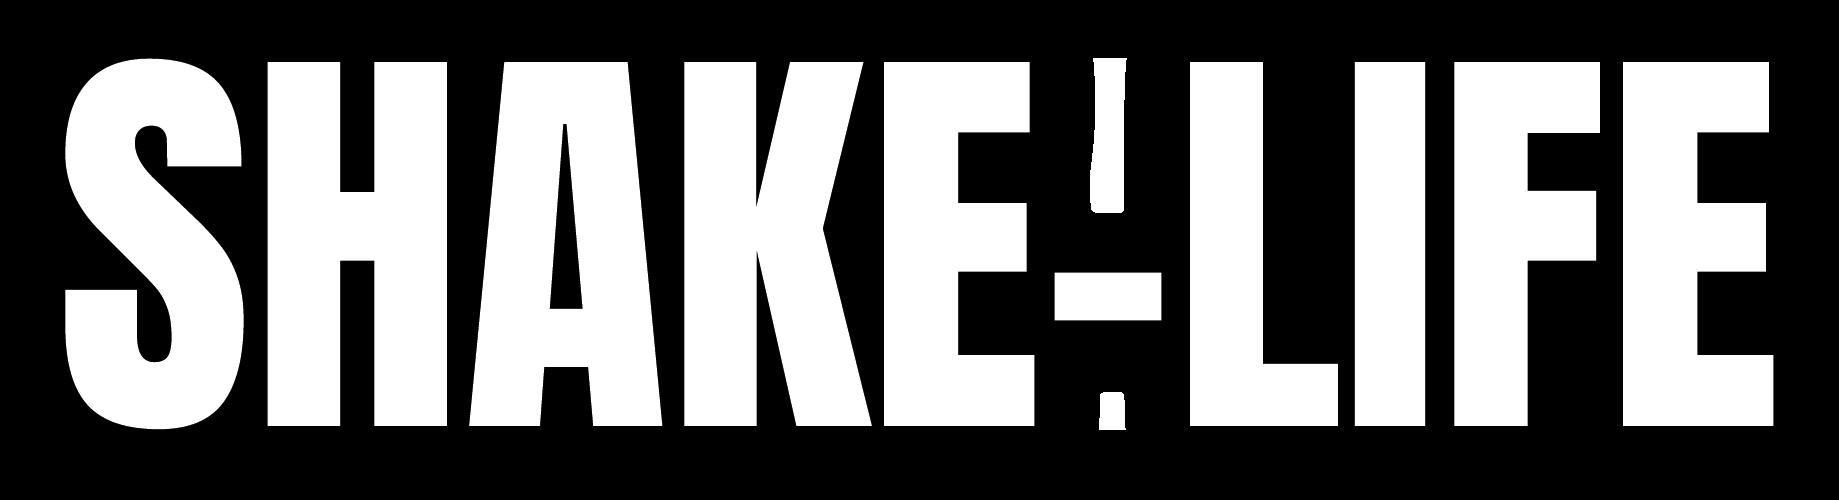 shakelife - shake up your life